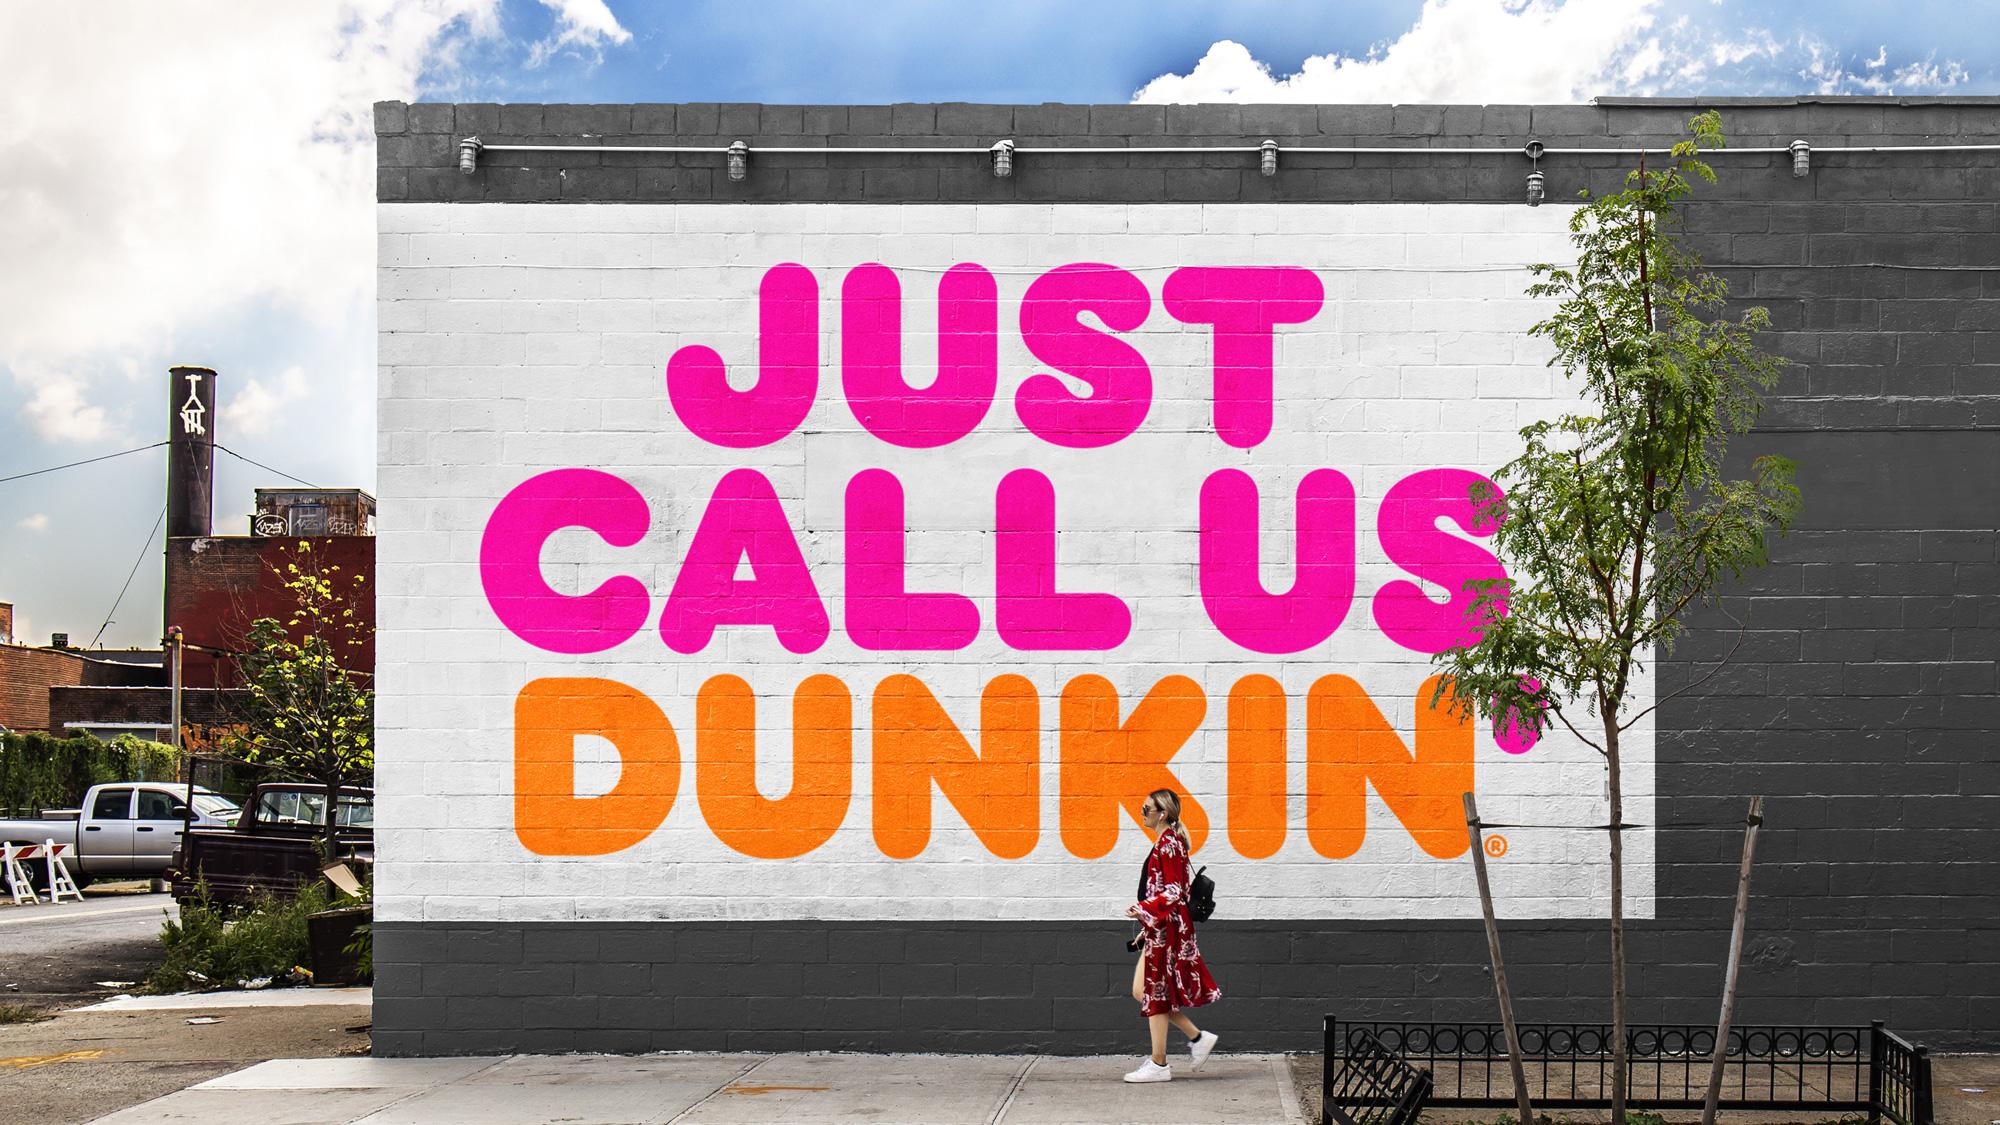 Dunkin', sorry I said DUNKIN'